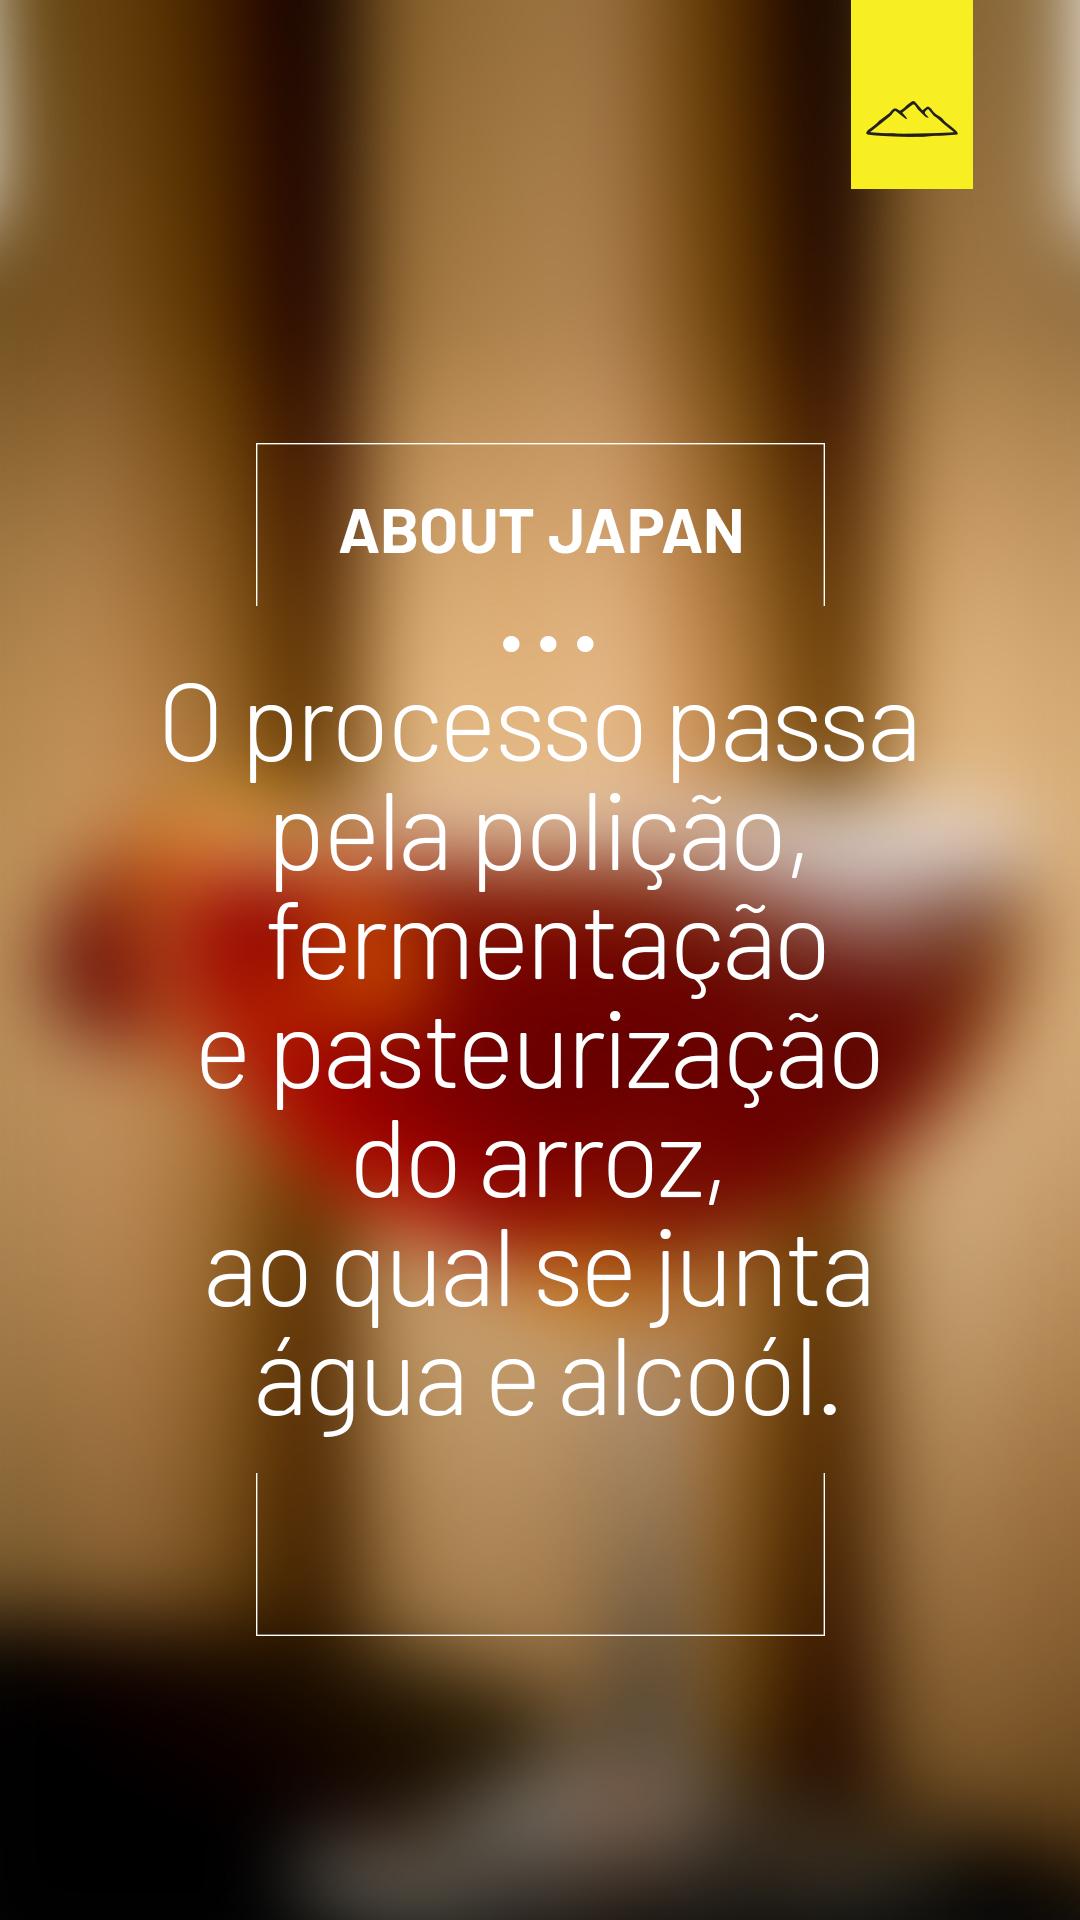 AFU_SM_PostStorie16_resposta2_AboutJapan_01S